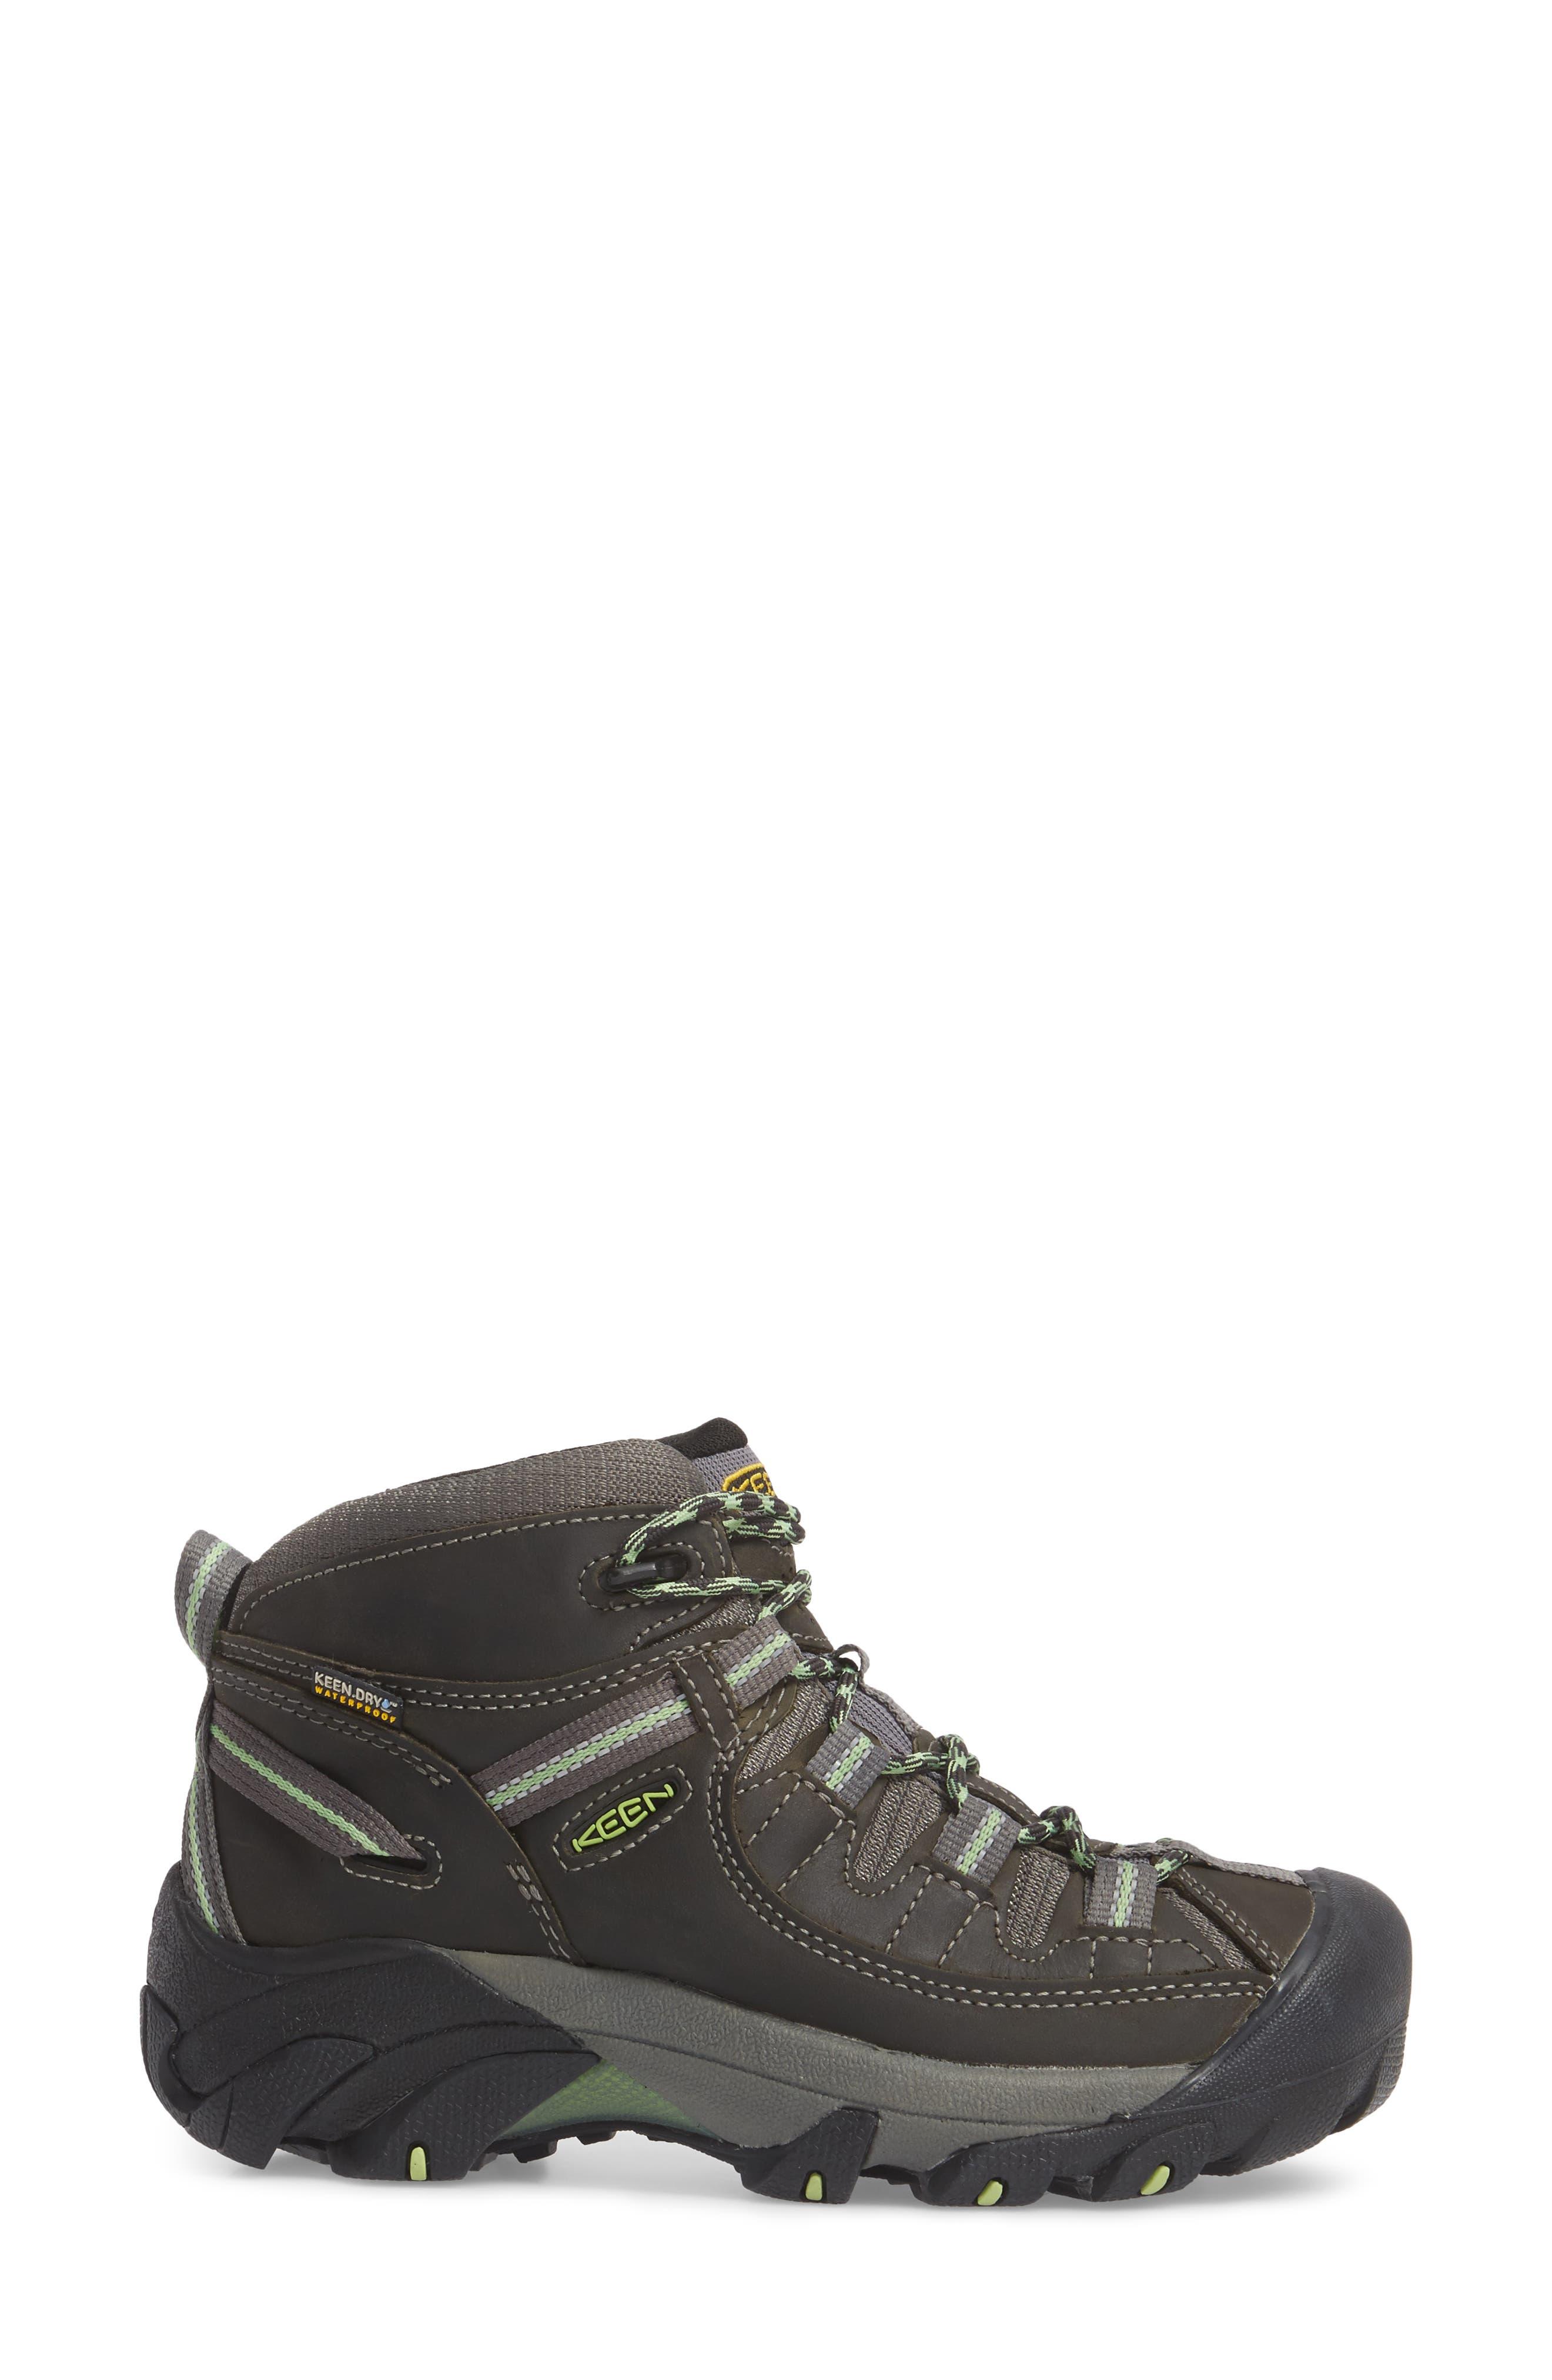 Targhee II Mid Waterproof Hiking Boot,                             Alternate thumbnail 3, color,                             RAVEN/ OPALINE